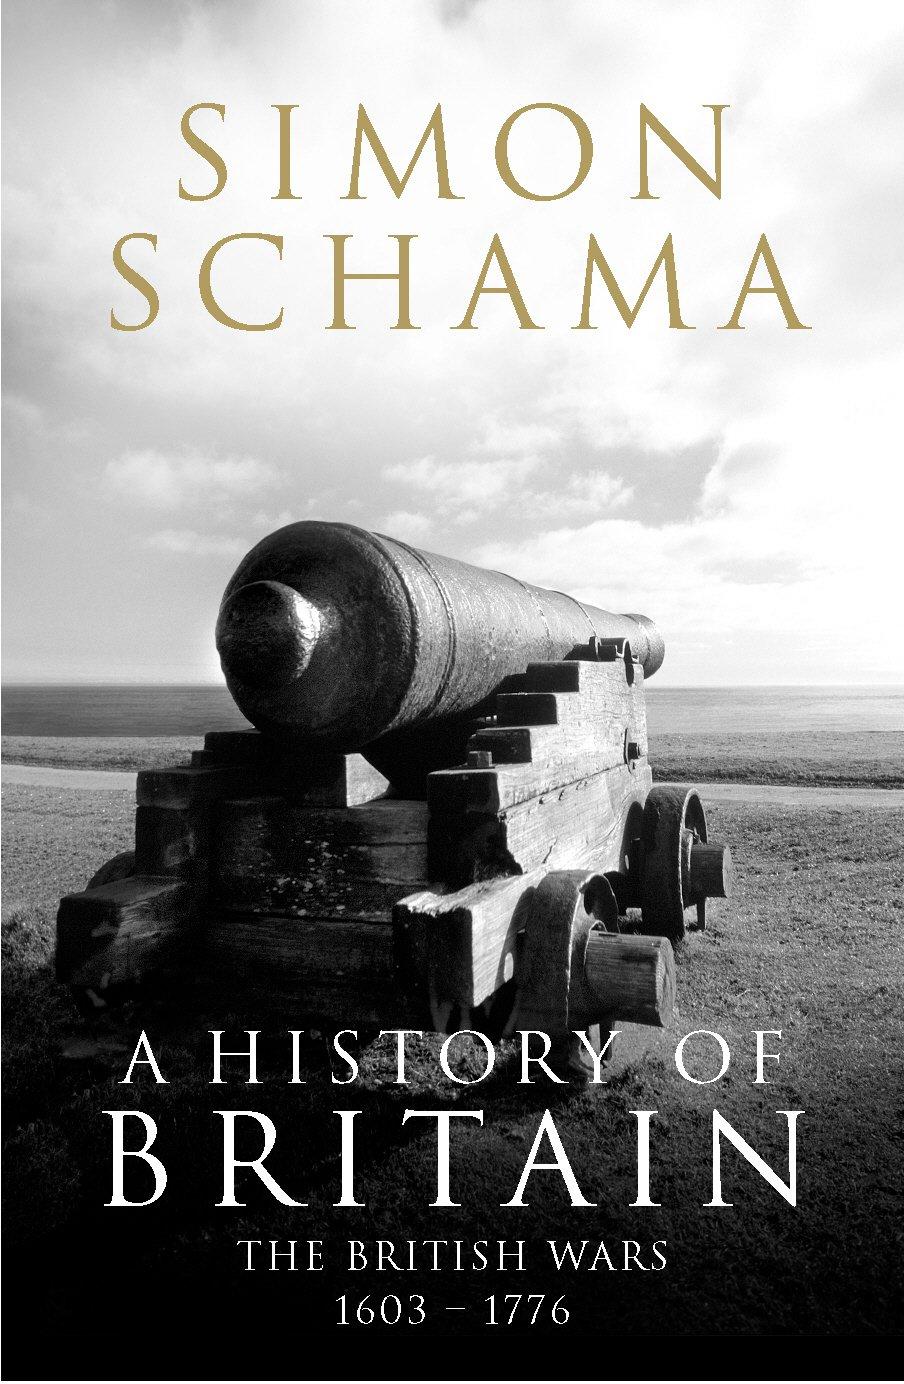 A History of Britain - Volume 2: The British Wars 1603-1776: Amazon.co.uk:  Schama, Simon: 9781847920133: Books